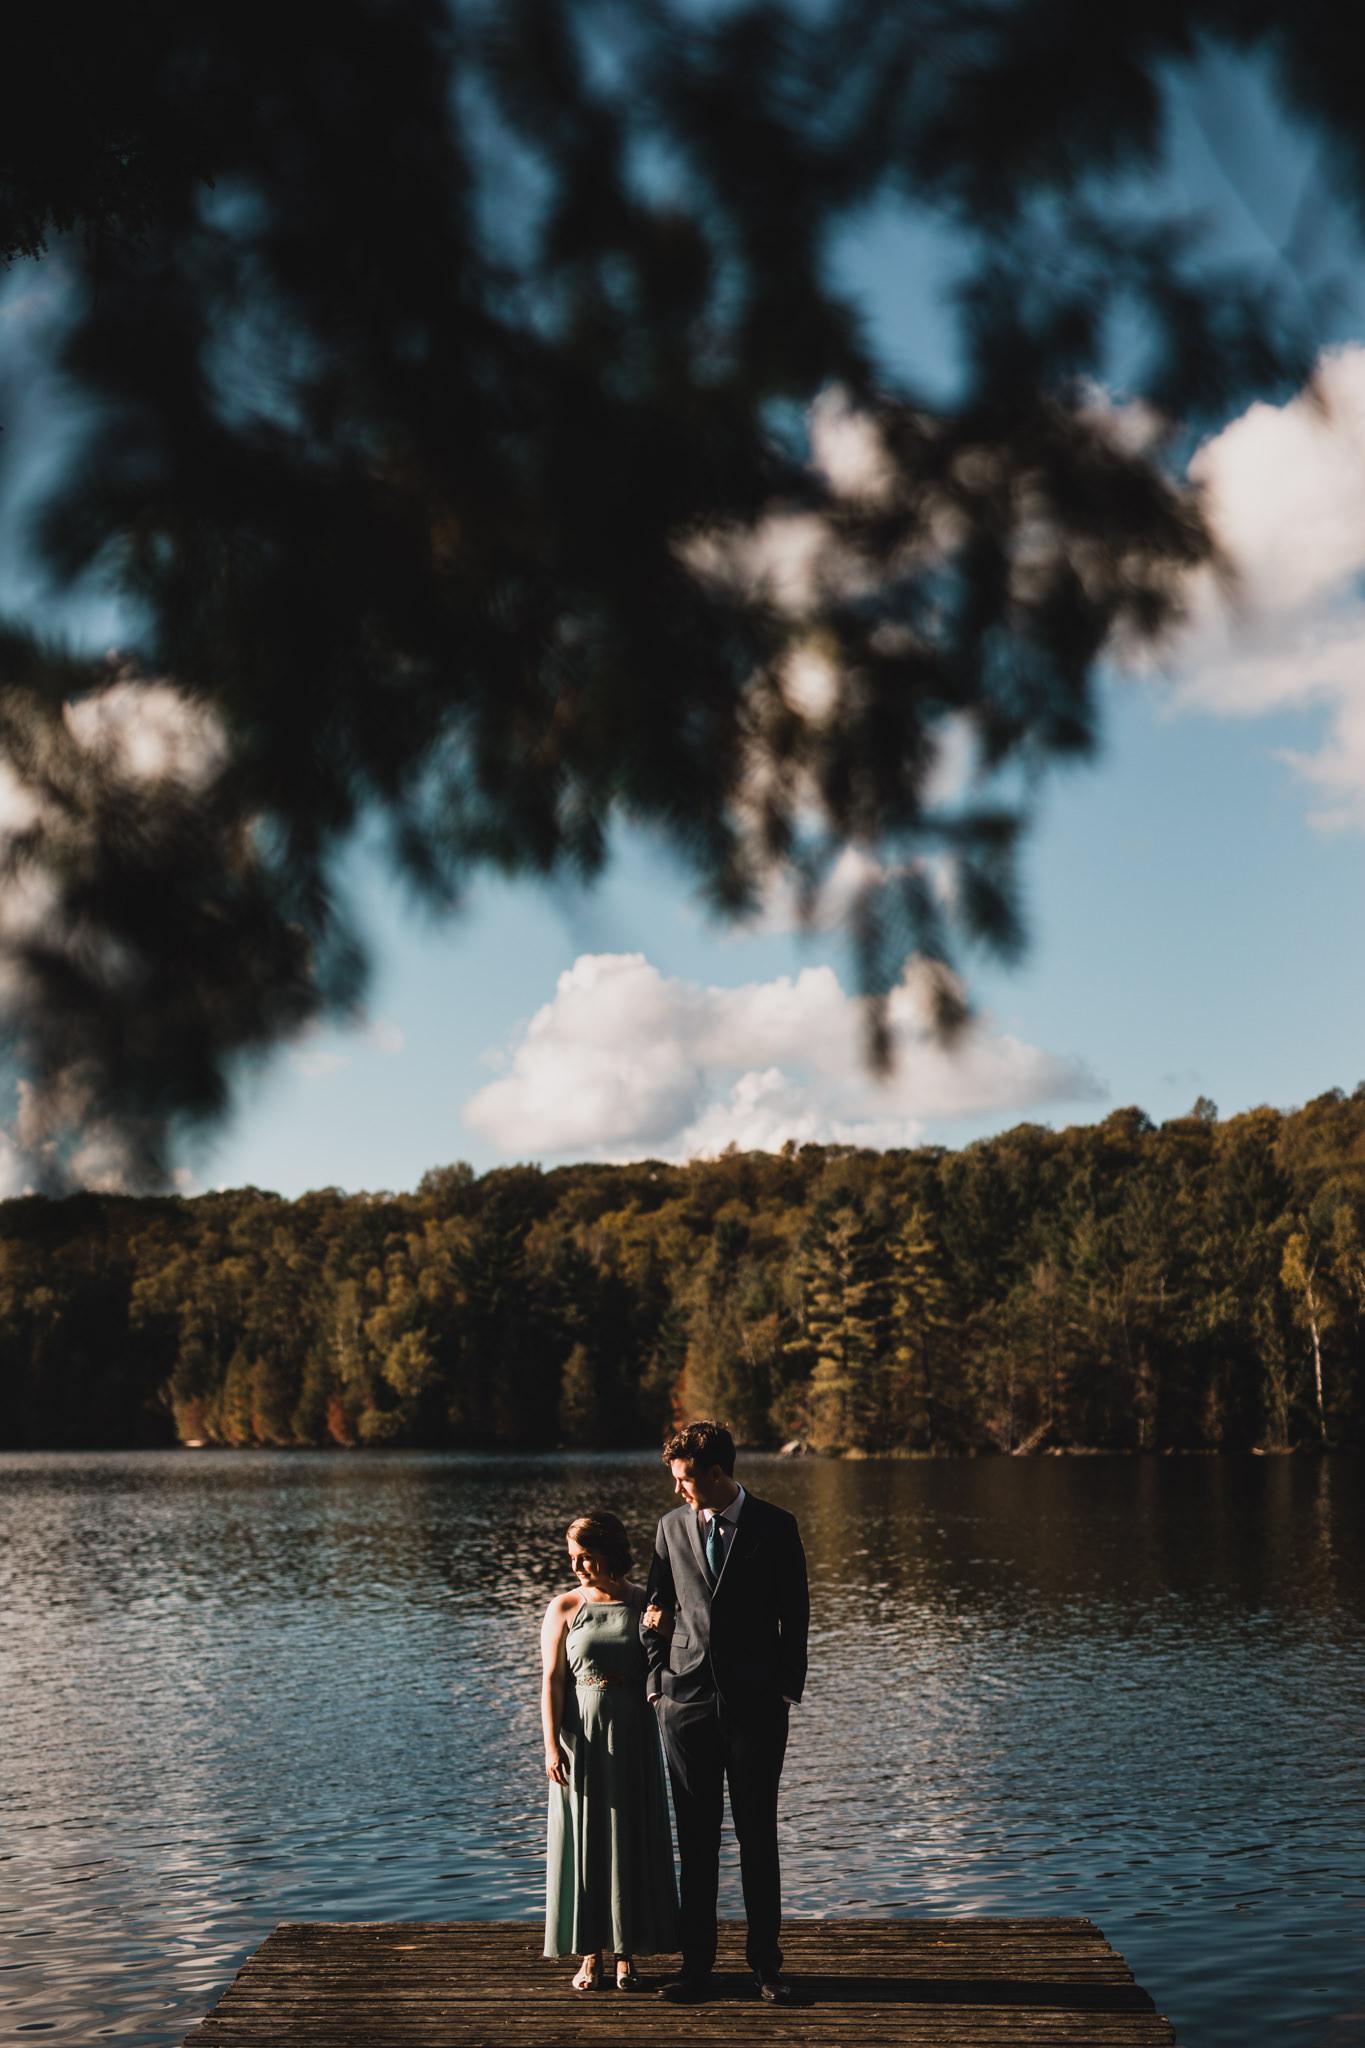 Outdoorsy, casual wedding in Ottawa